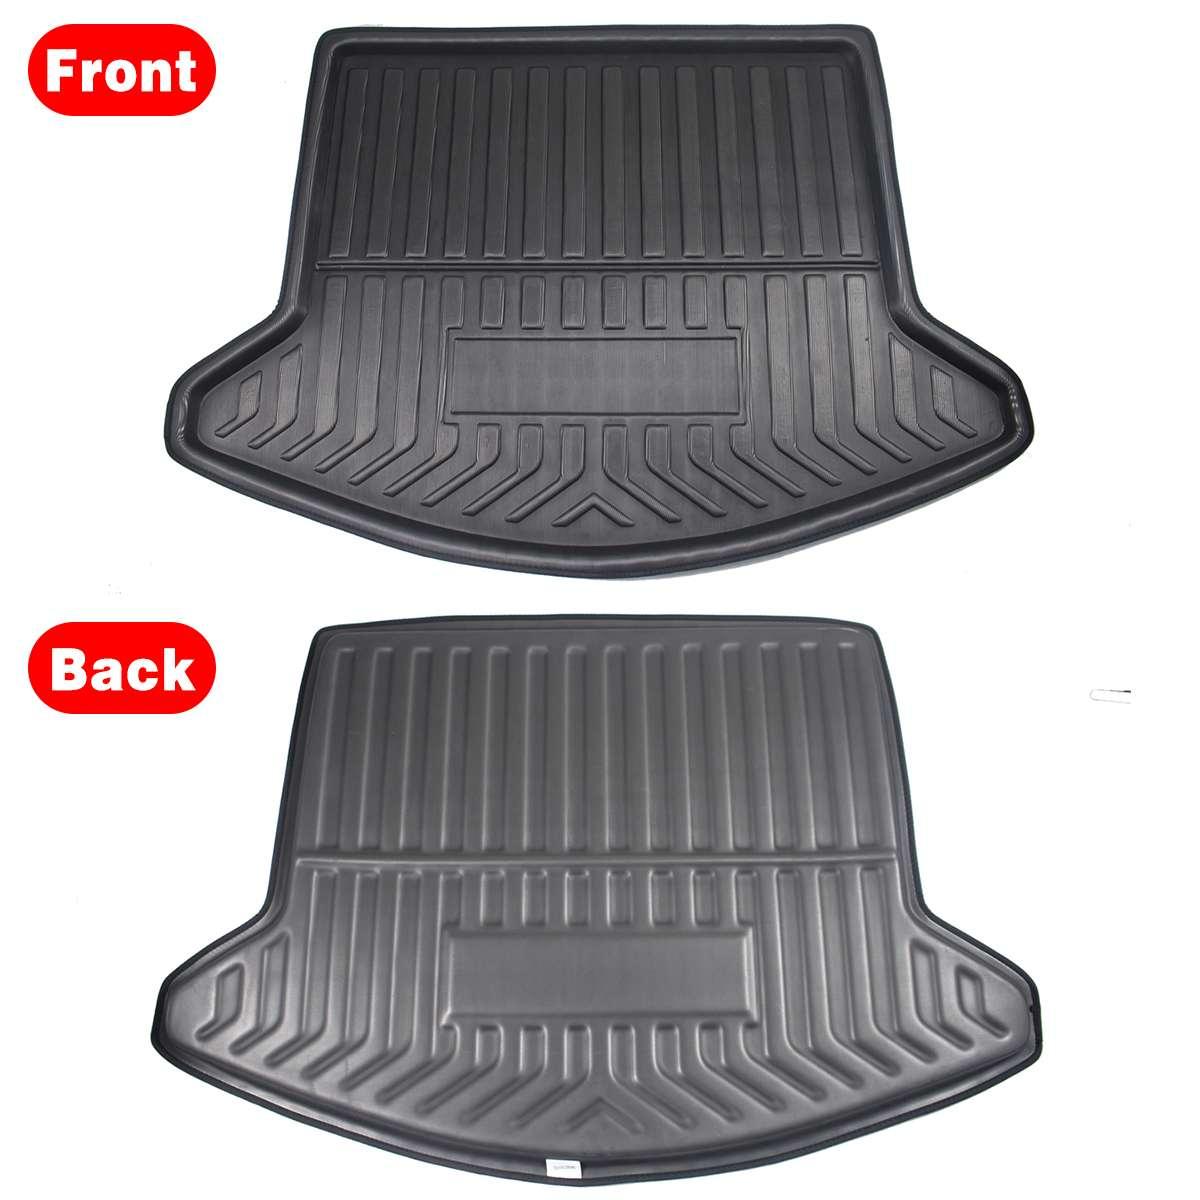 Image 4 - Cargo Liner Boot Tray Rear Trunk Cover Matt Mat Floor Carpet Kick Pad Mud Non slip For Mazda CX 5 CX5 MK2 2017 2018 2019 2nd